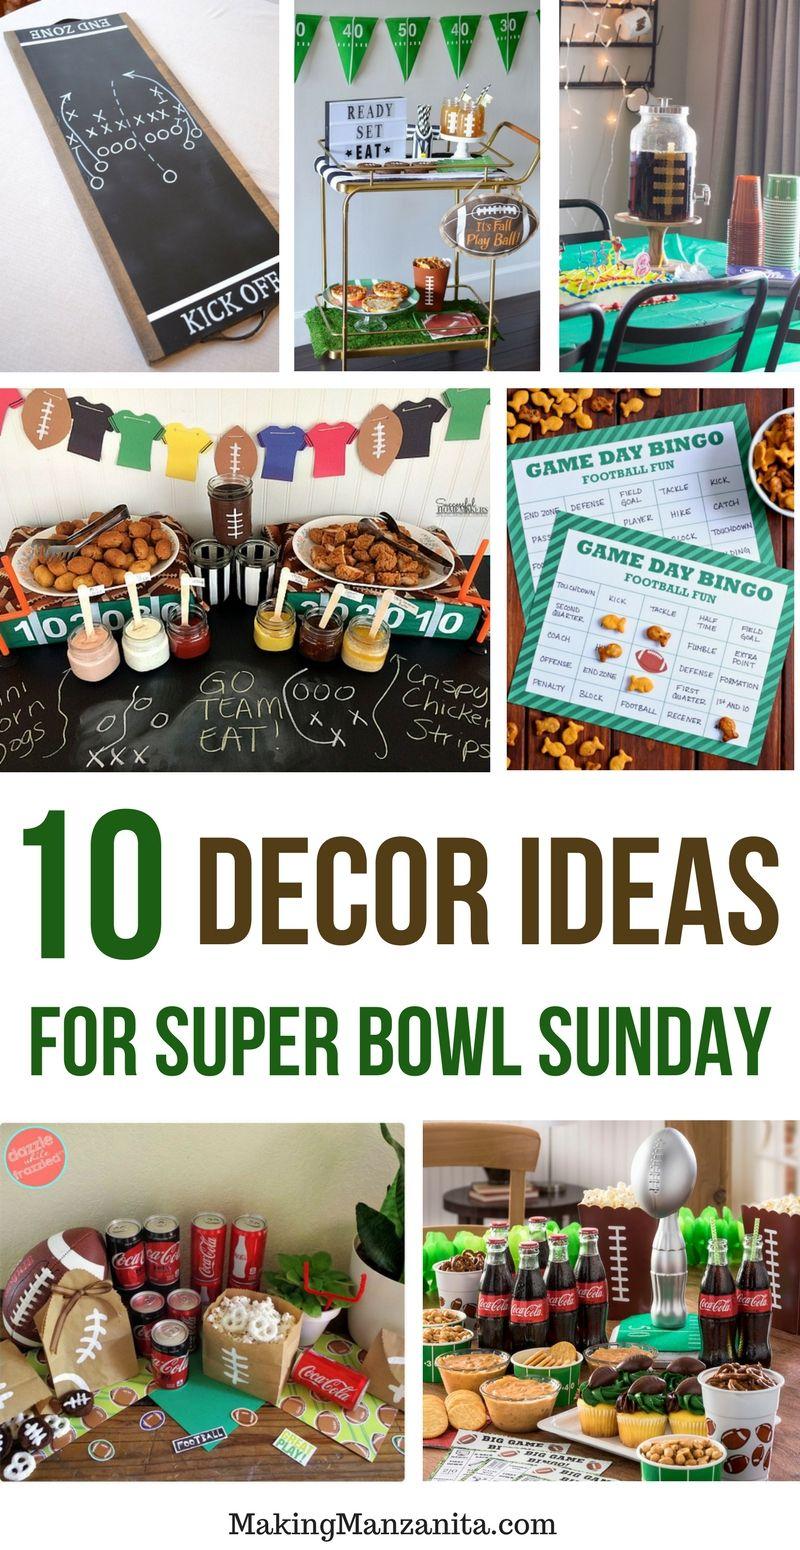 10 Delicious Super Bowl Recipes 10 Creative Super Bowl Decorations Super Bowl Decorations Superbowl Party Superbowl Party Decorations